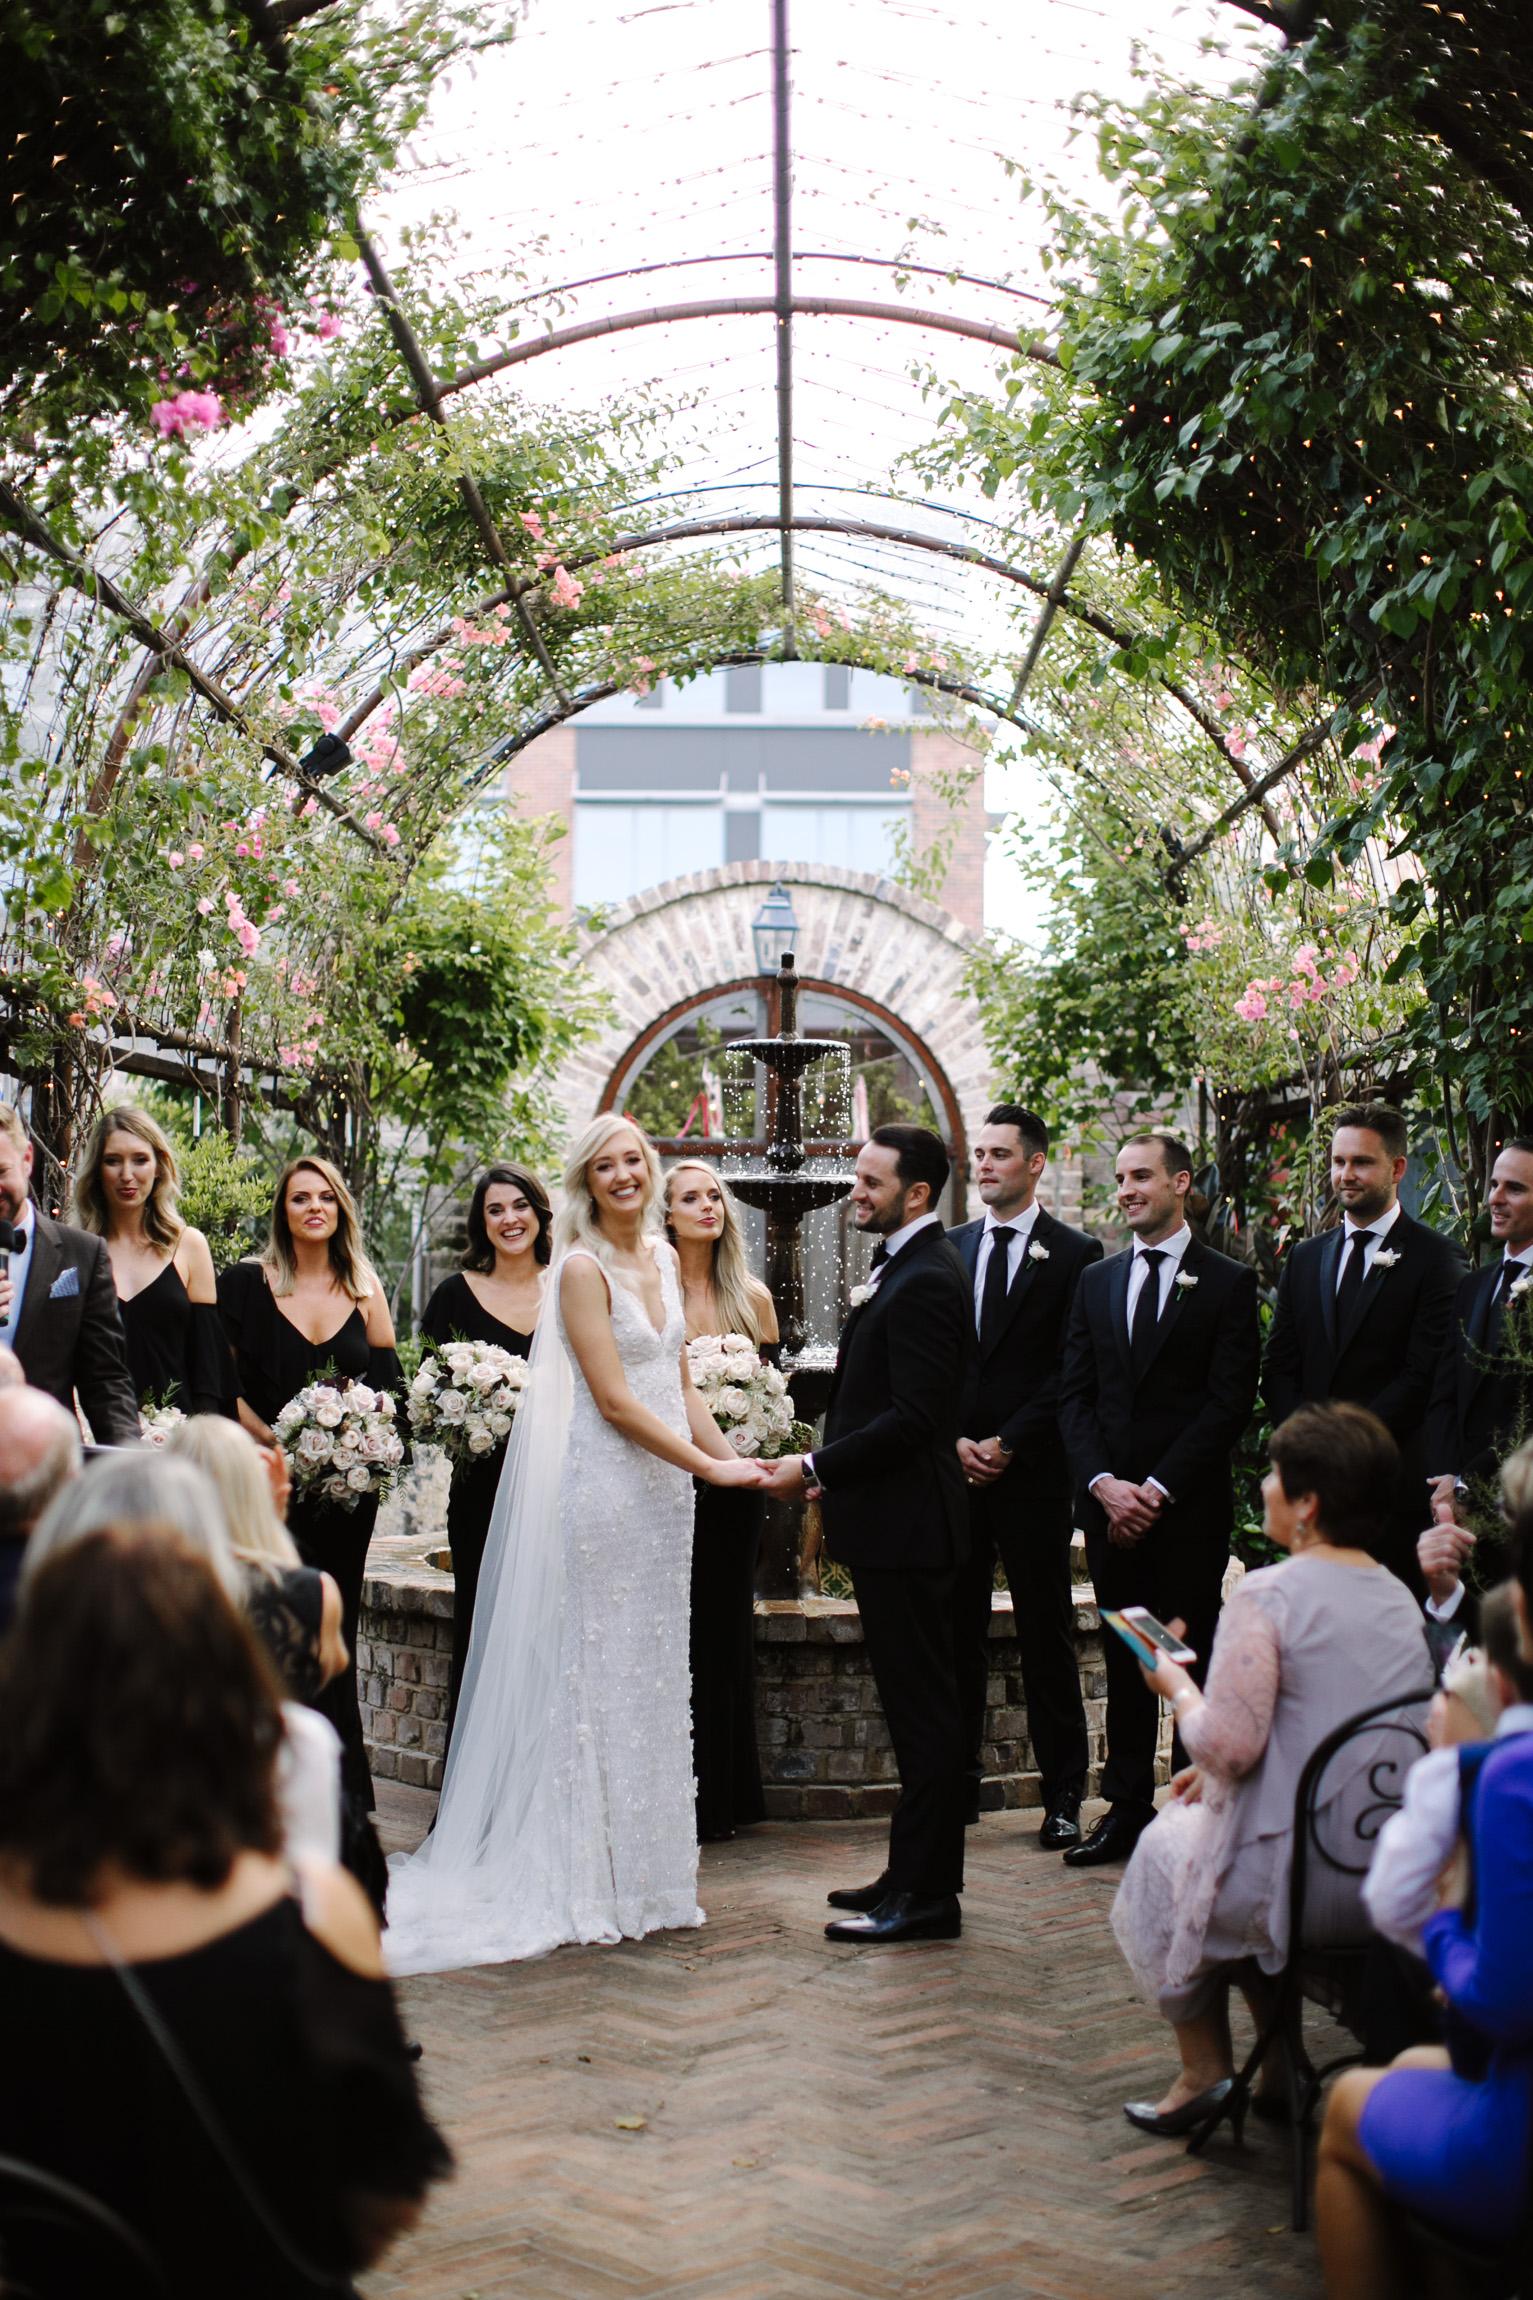 180223_justinaaron_wedding_charlotte_david_h-108.jpg